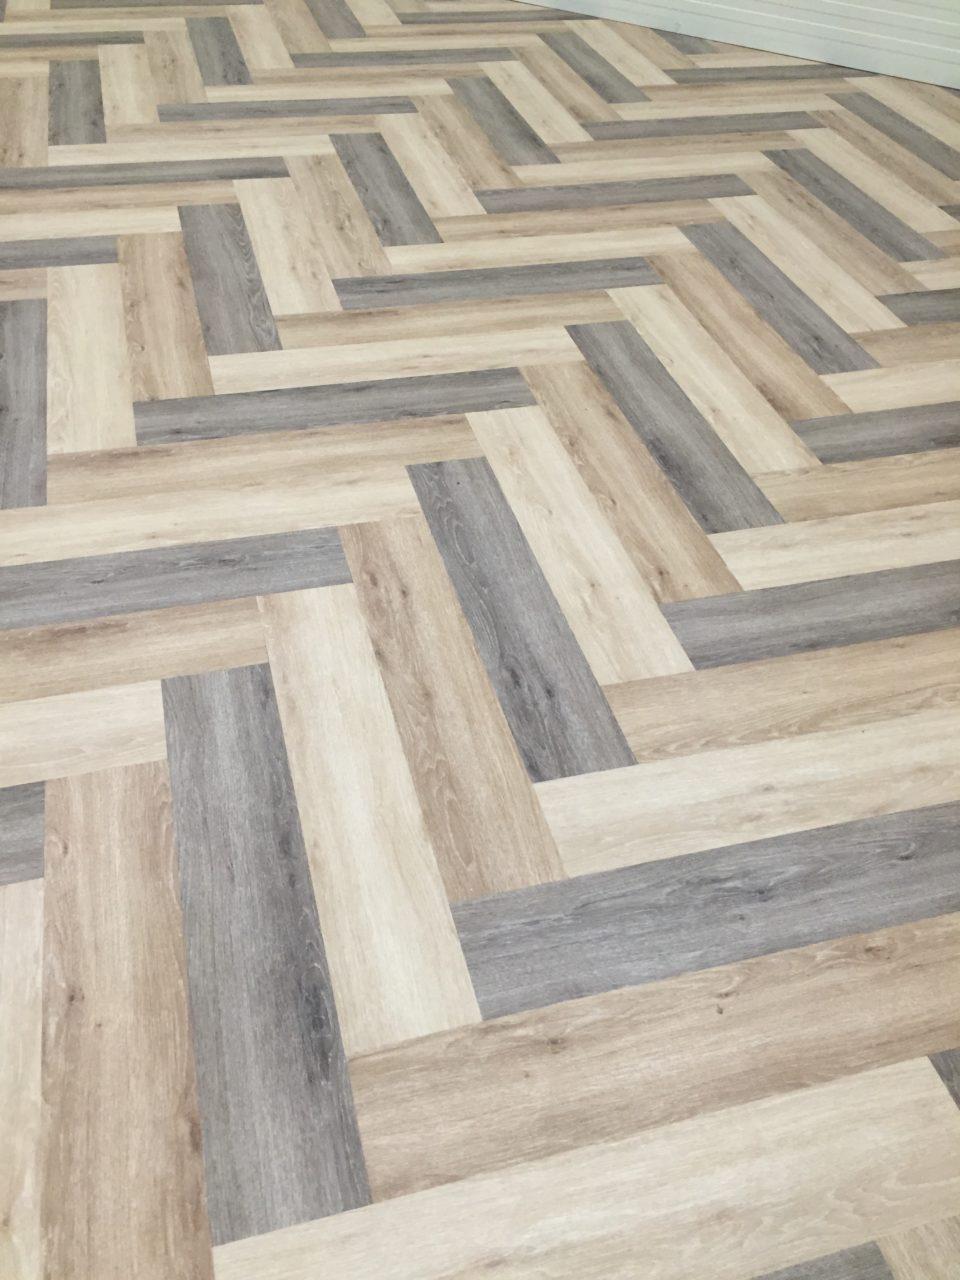 industrieboden-gewerbeboden-contract-planke-holzlook-pvc-planke-platte-büro-wohnen-4